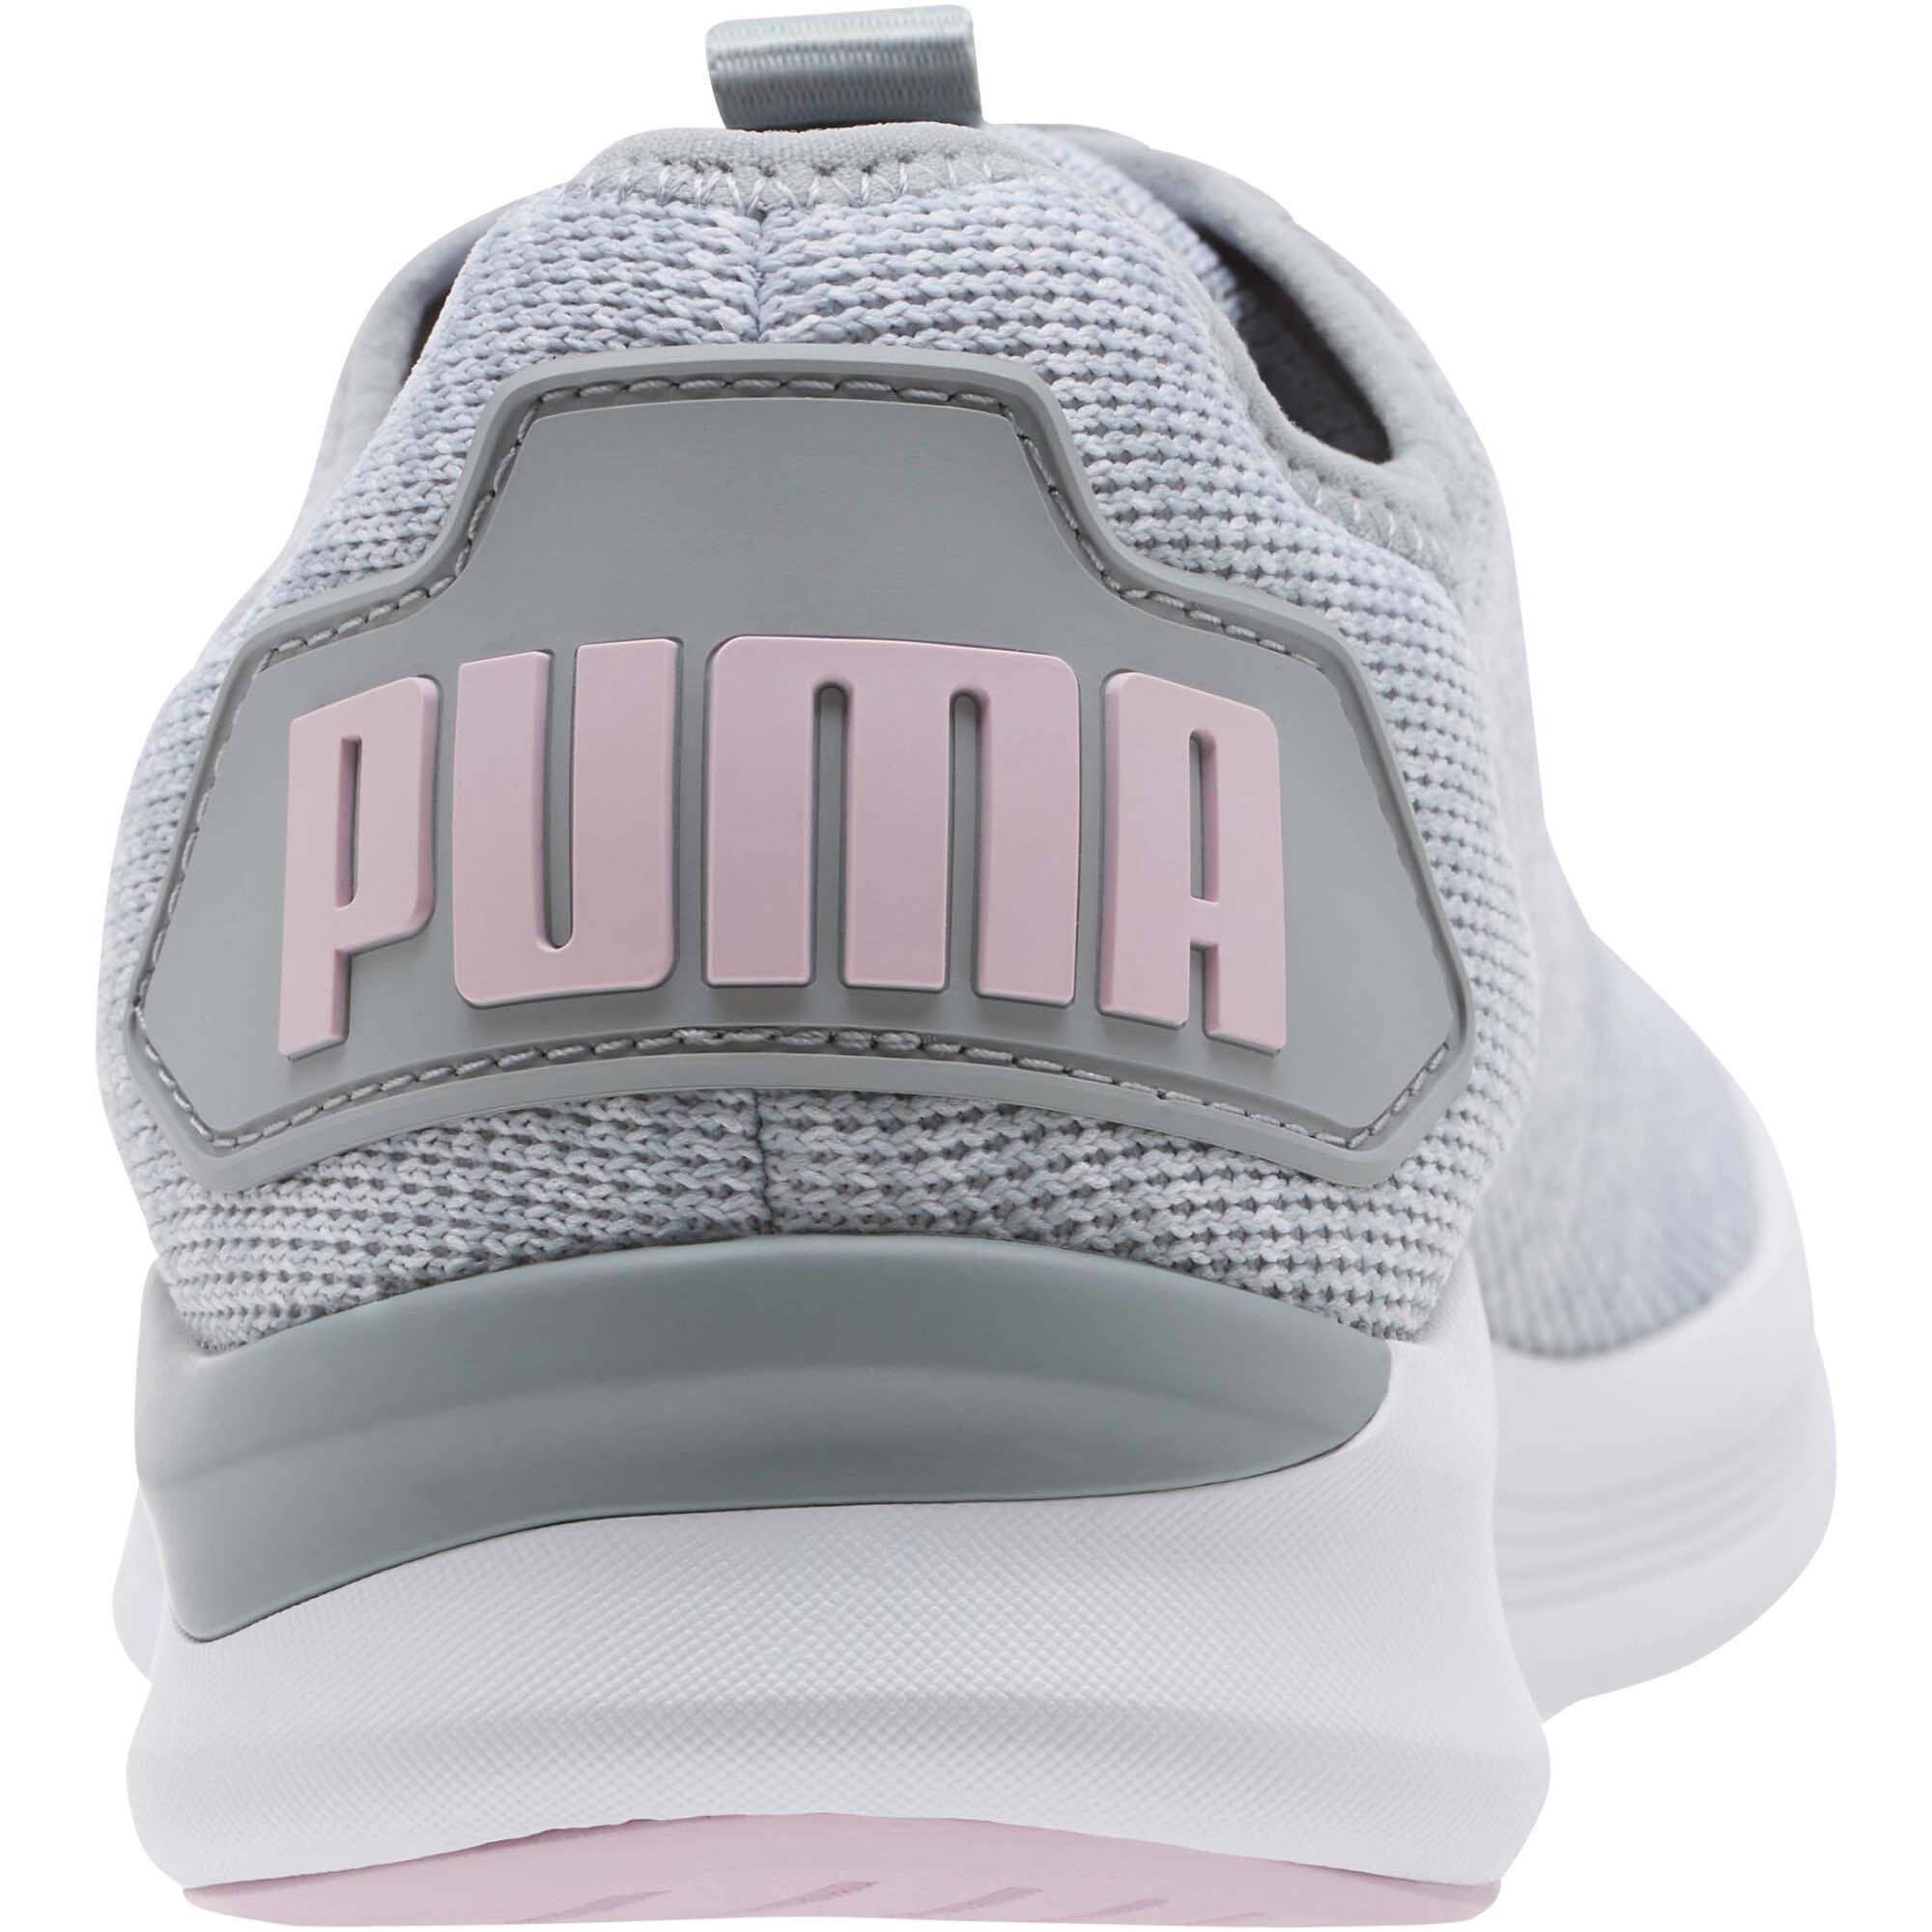 PUMA-Ballast-Women-039-s-Running-Shoes-Women-Shoe-Running thumbnail 18